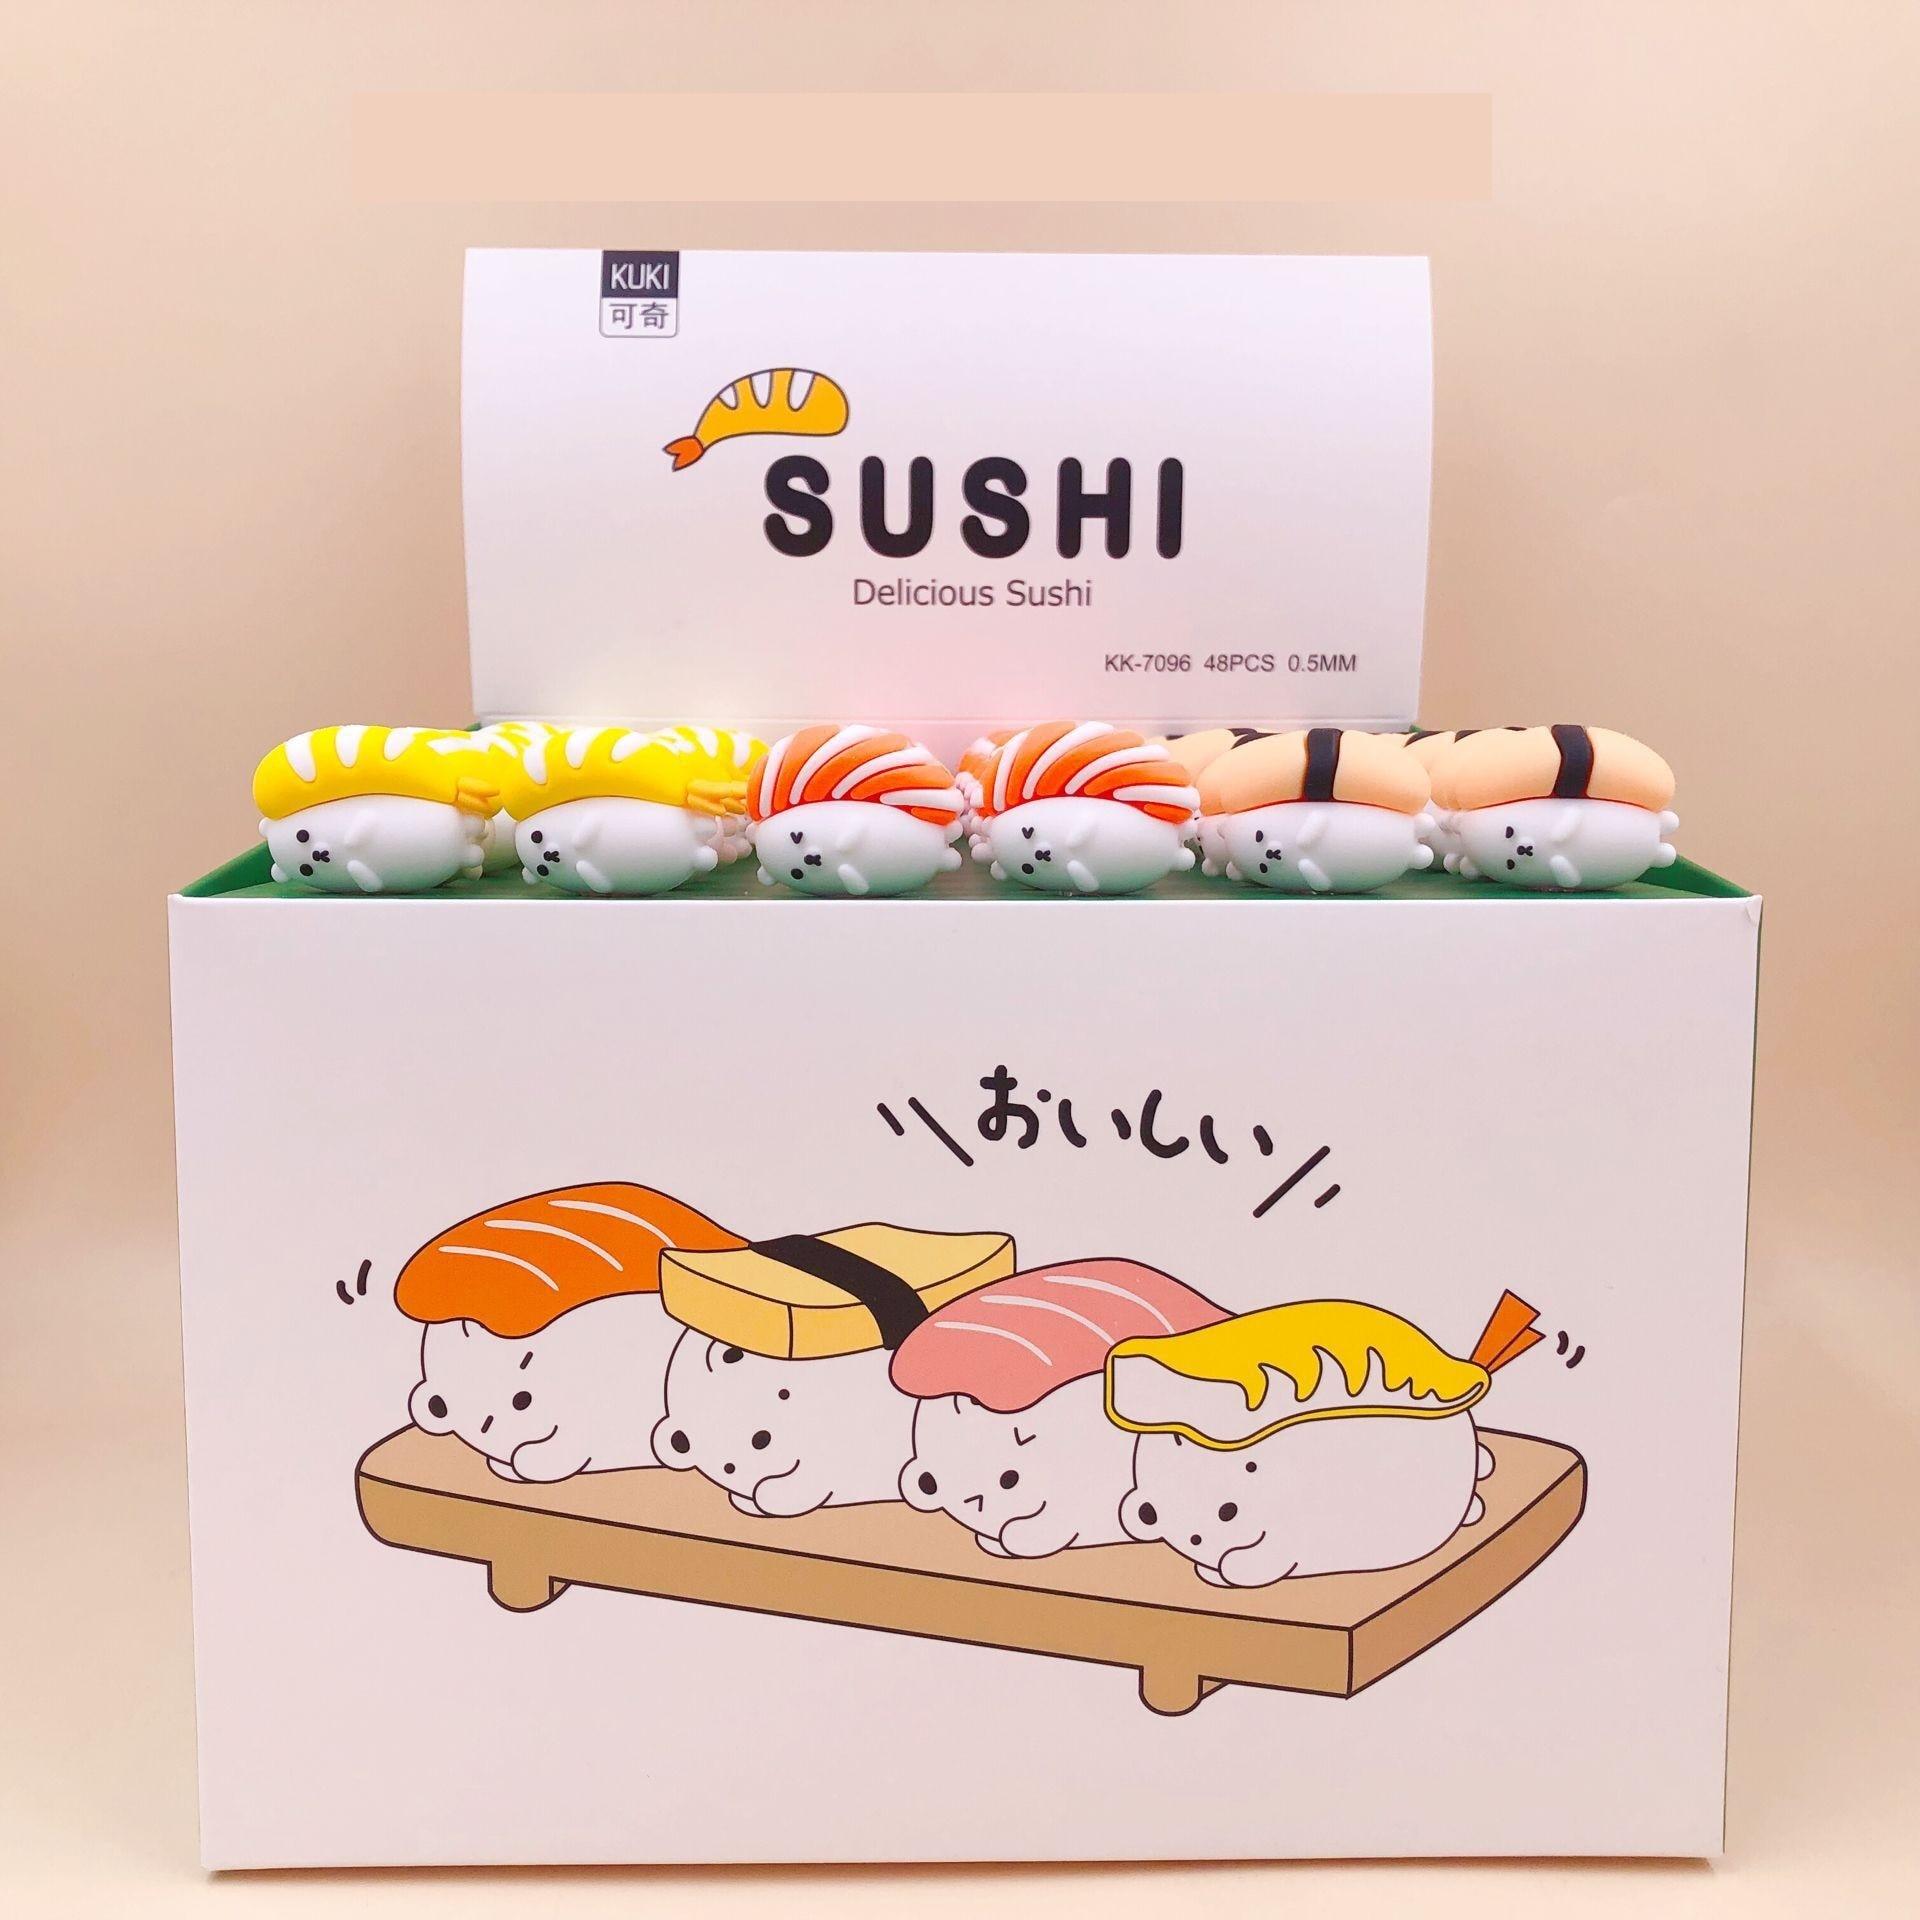 48 unids/lote creativo de sushi comida japonesa gel pluma bolígrafos oficina útiles escolares para estudiantes Regalo de Promoción